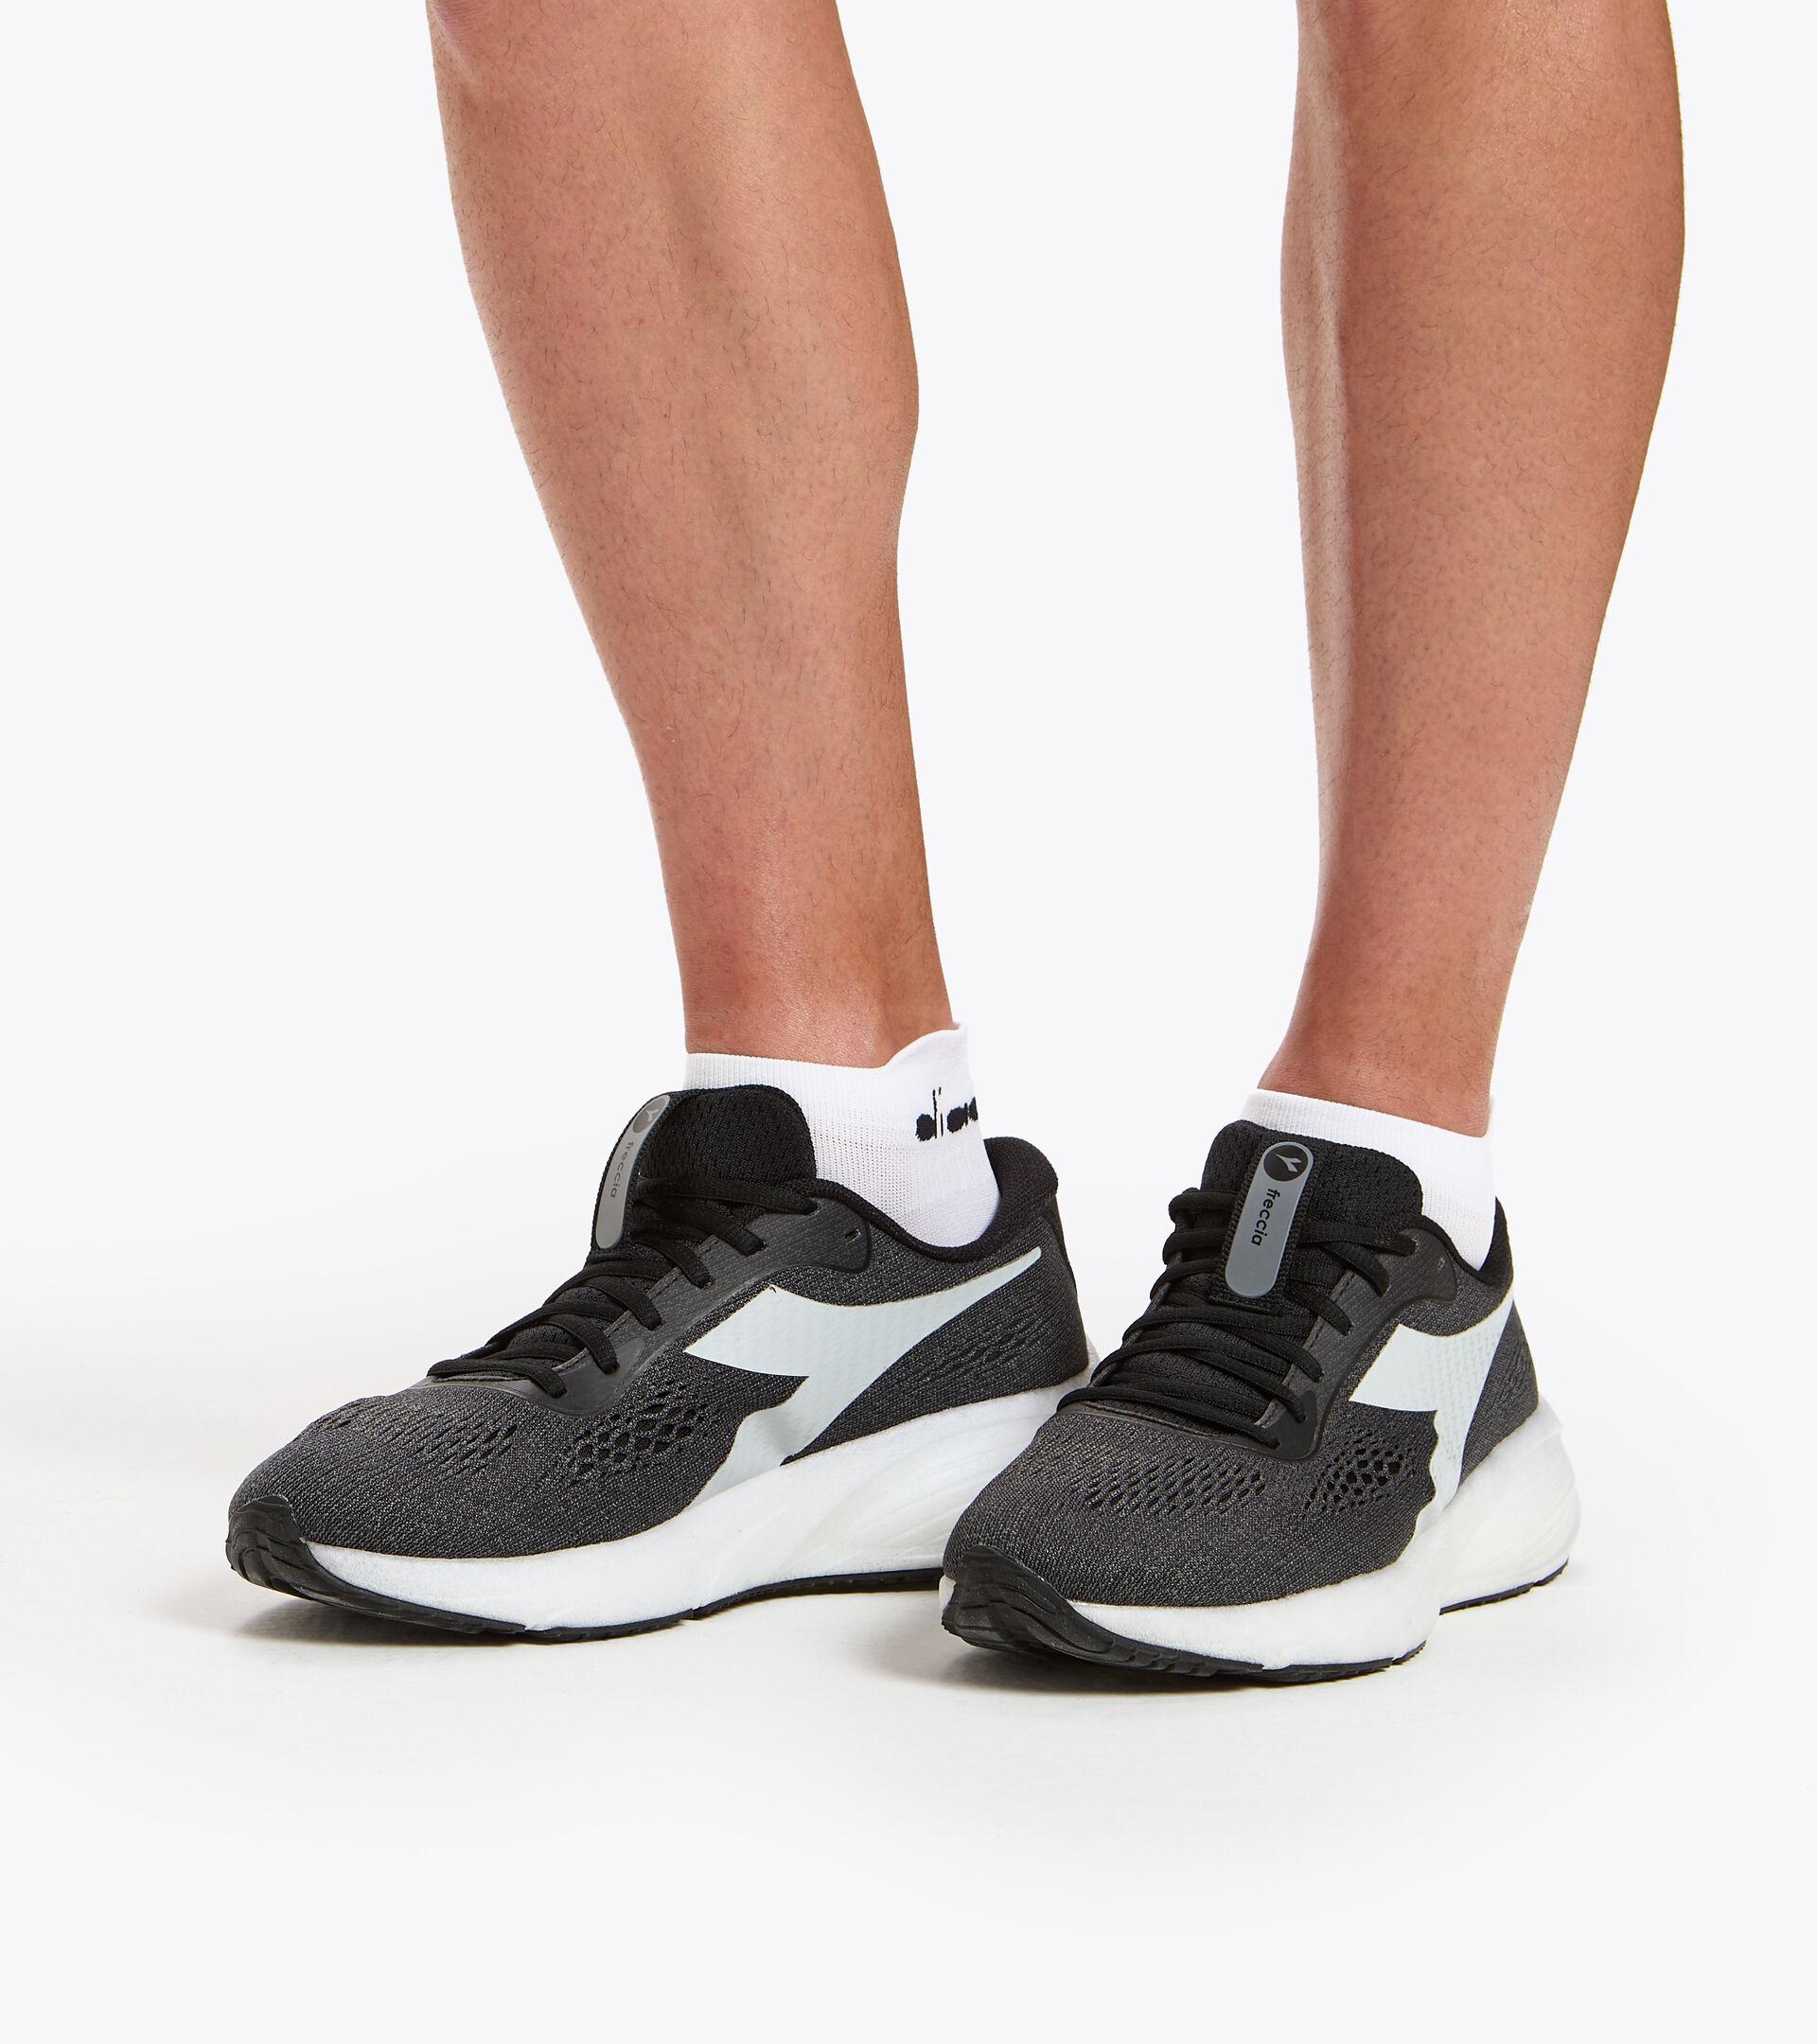 Footwear Sport UOMO FRECCIA NERO/GRIGIO ACCIAIO/BIANCO Diadora